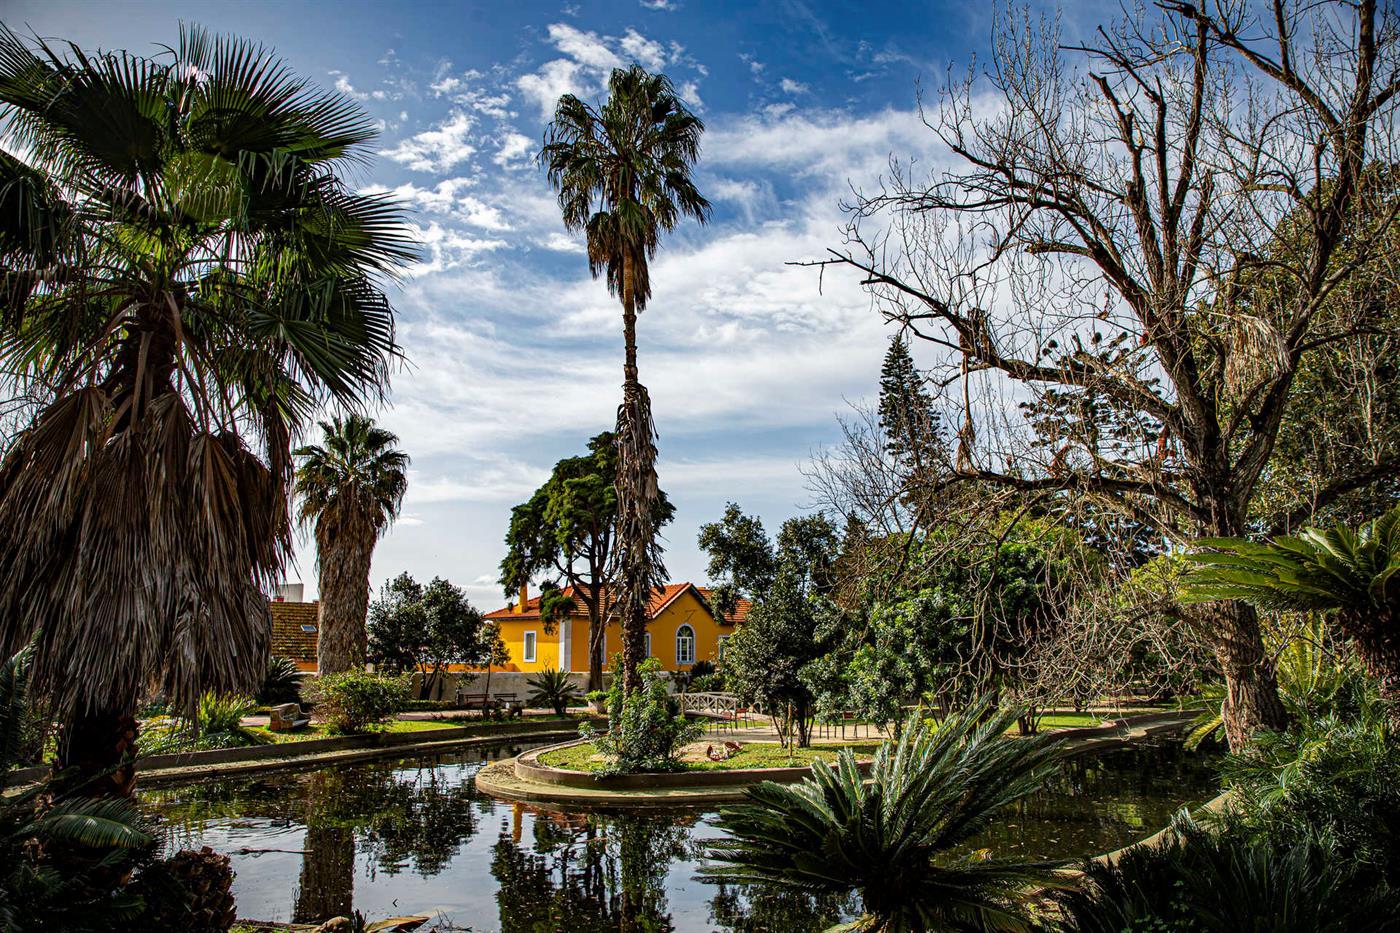 Jardim Botanico Tropical de Belém